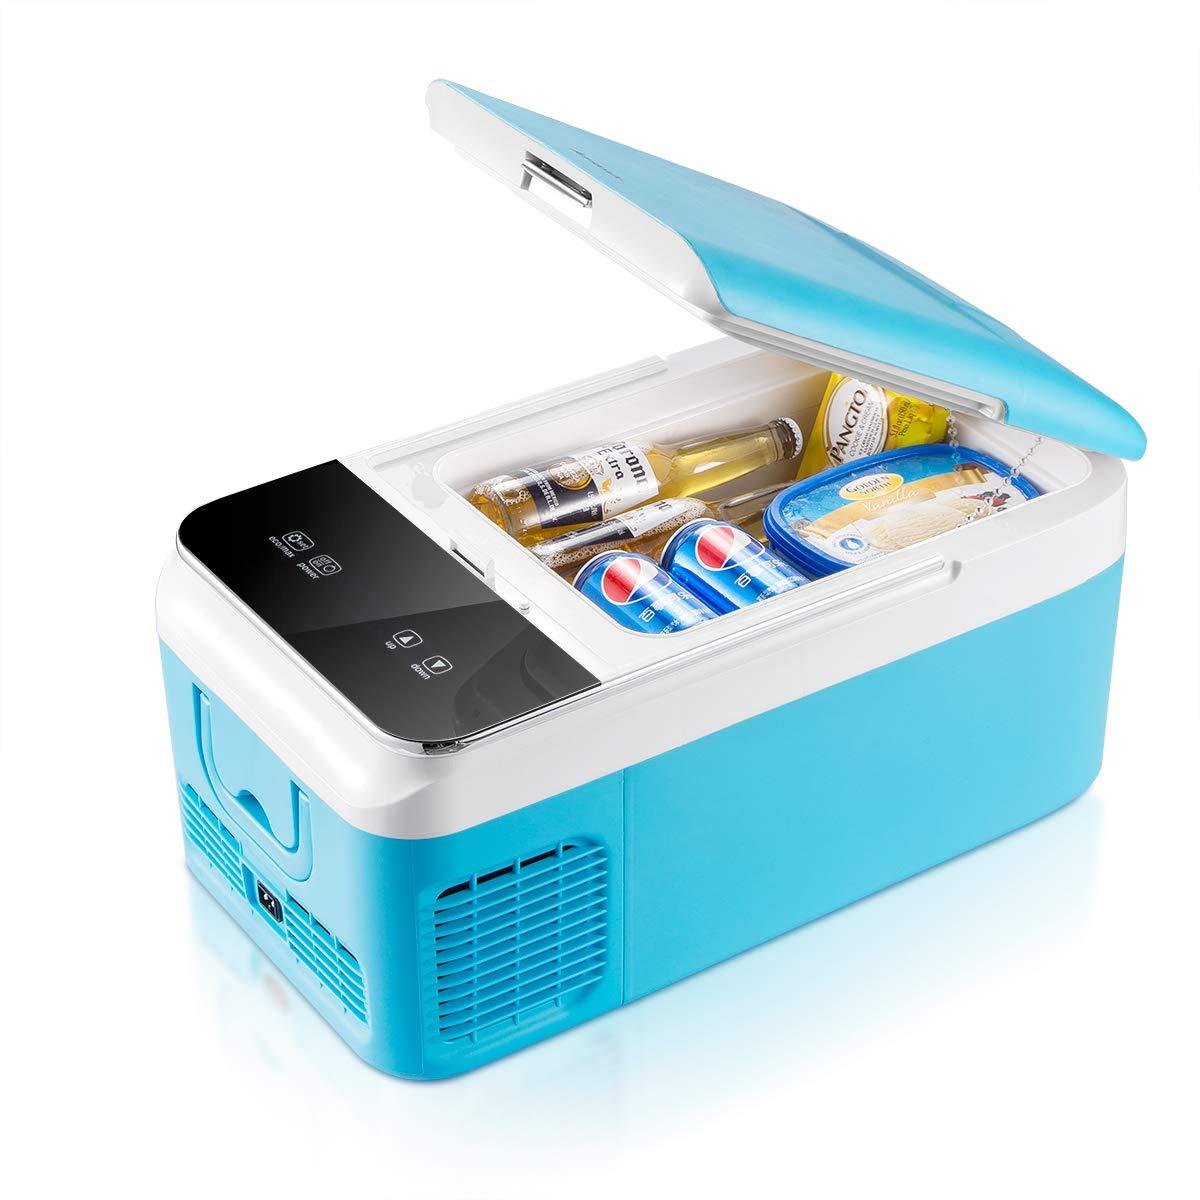 Ausranvik Car Fridge Portable Freezer (16 Quart), 12V Fridge, -4°F~50°F, DC 12V and AC 110V Compatible, Digital Touch Control